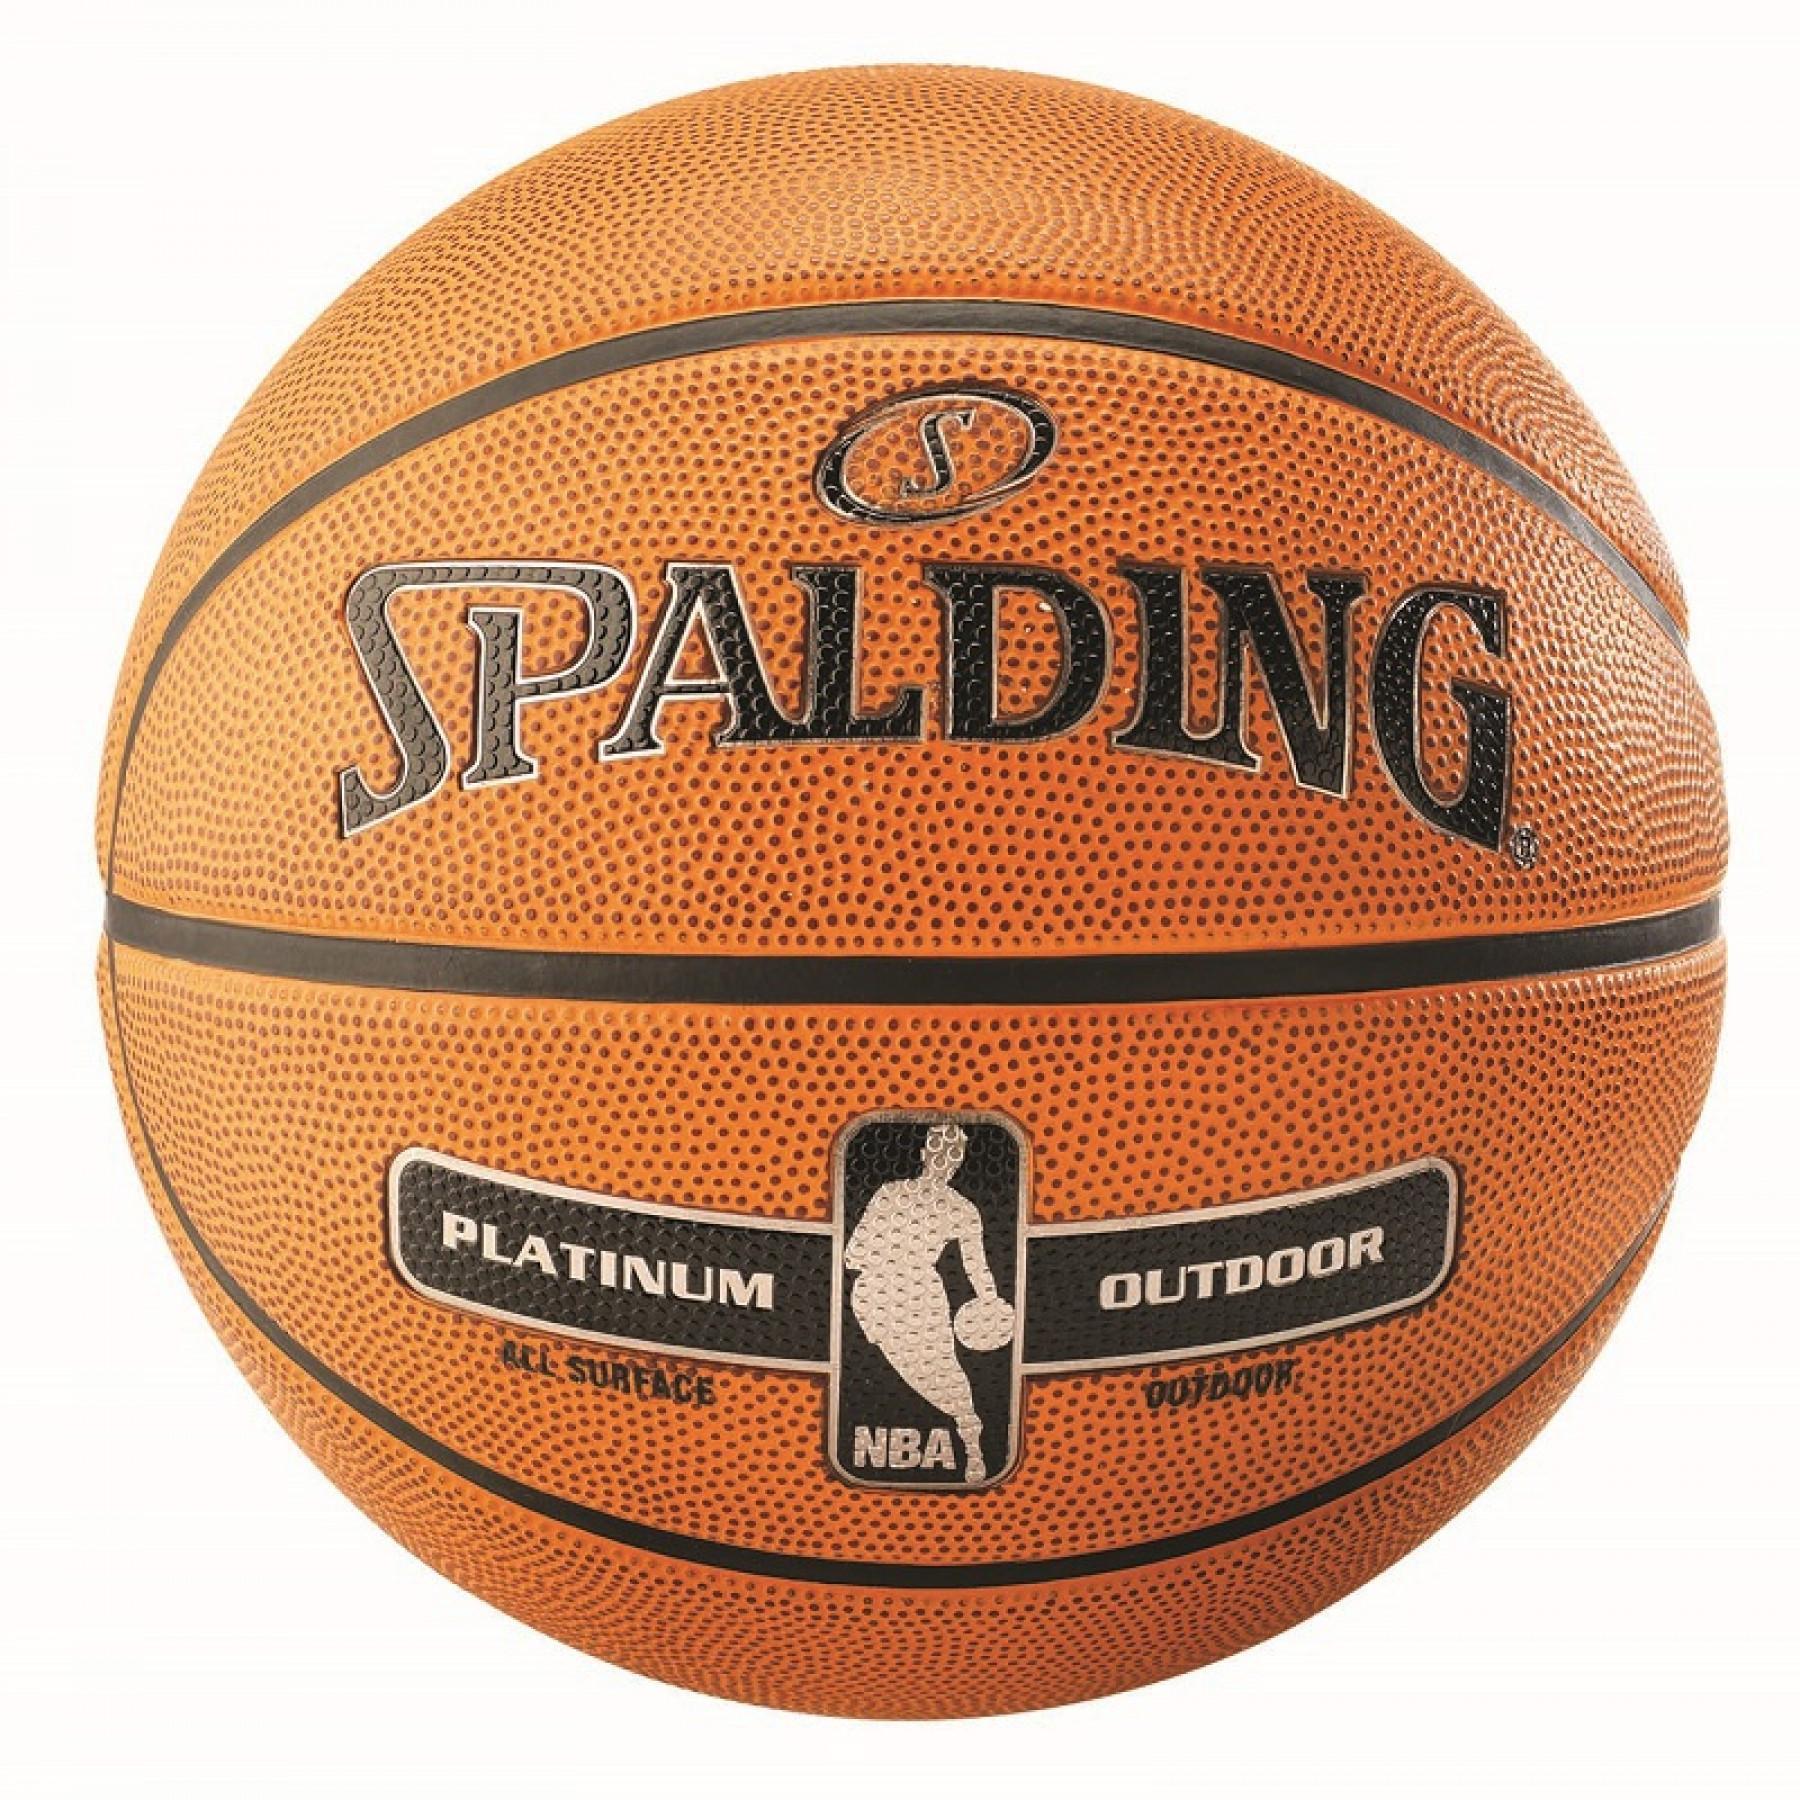 Balloon Spalding NBA Platinum Outdoor